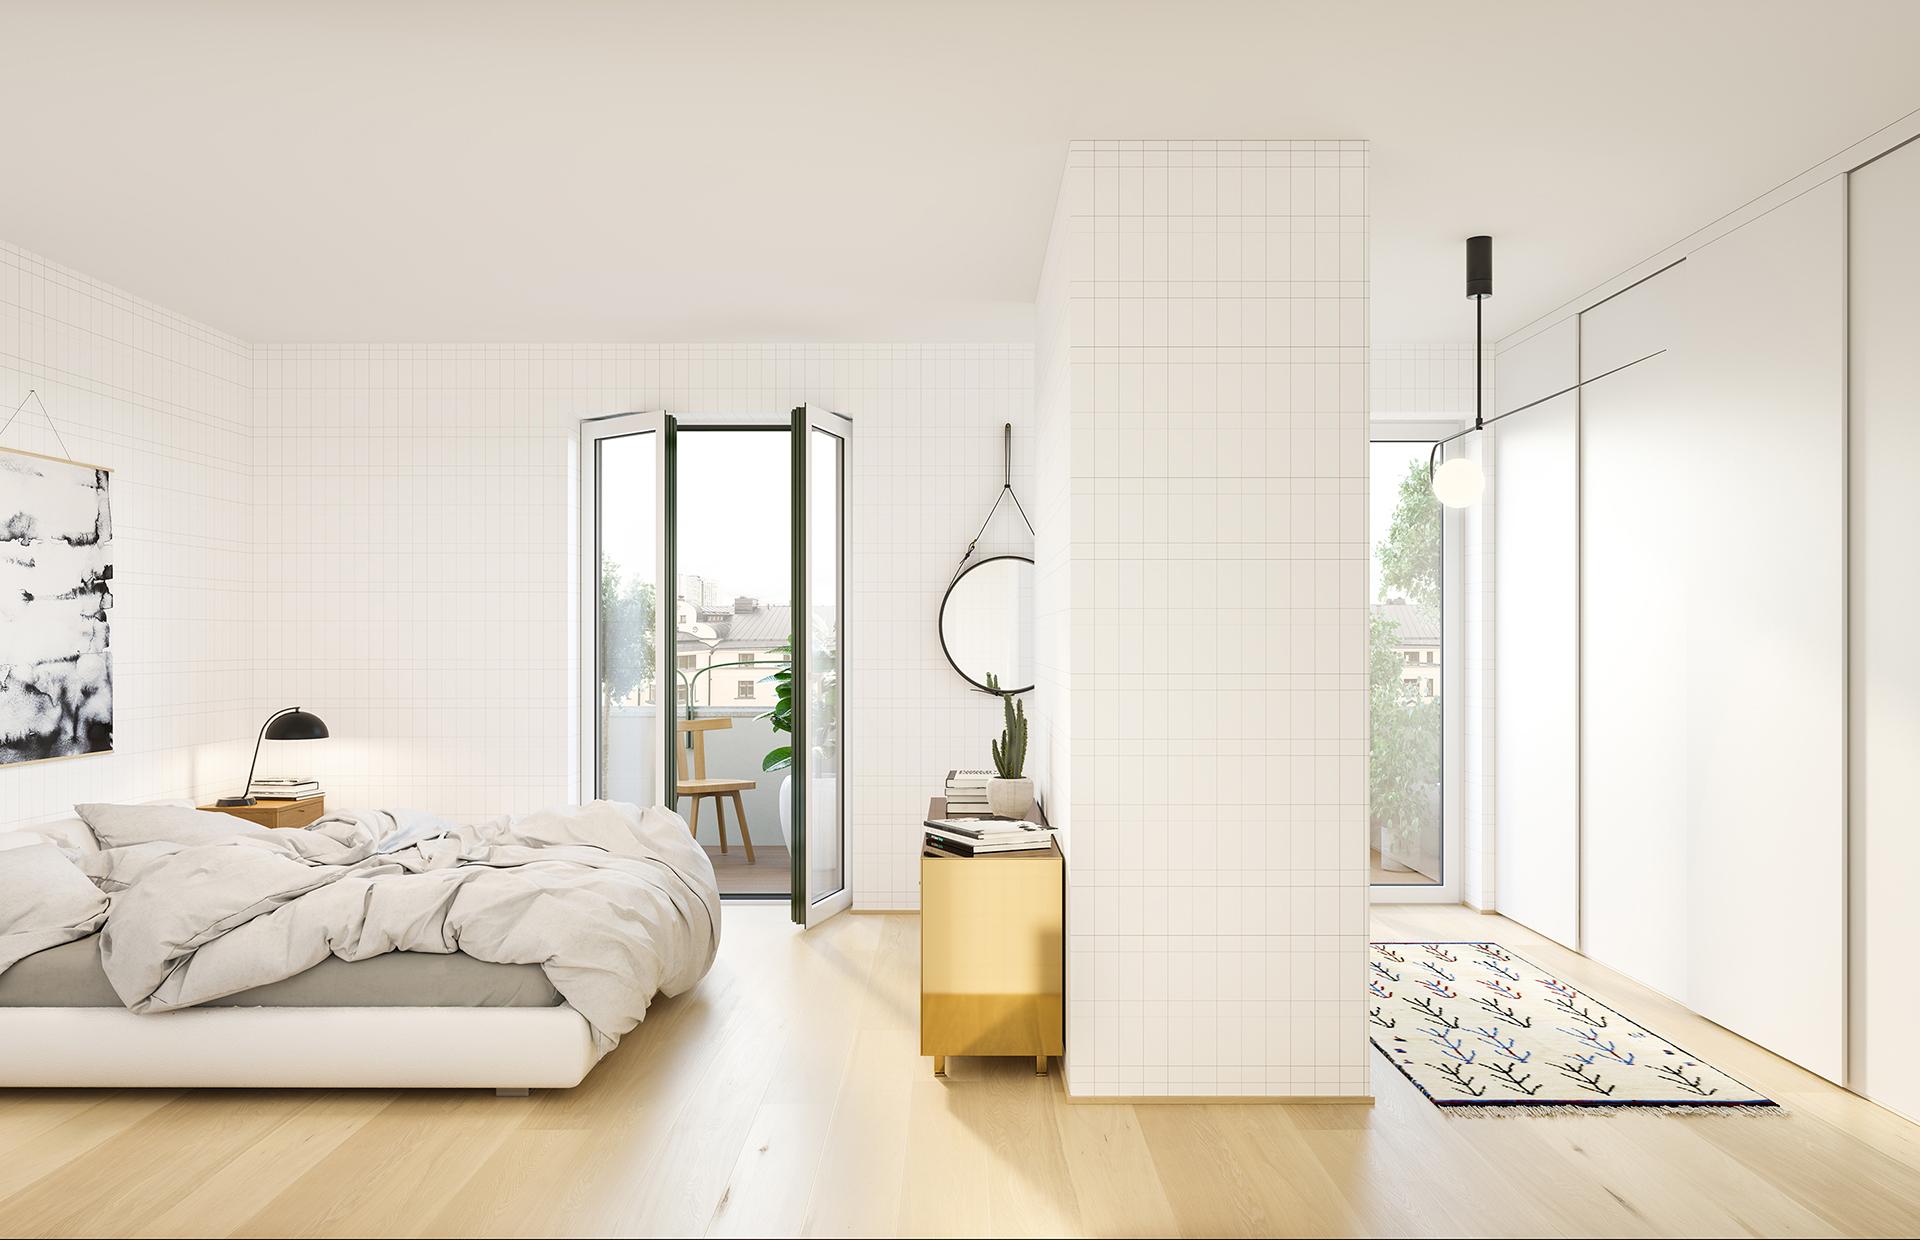 5_Bedroom-Claesson-Koivisto-Rune-Fantastic-Frank